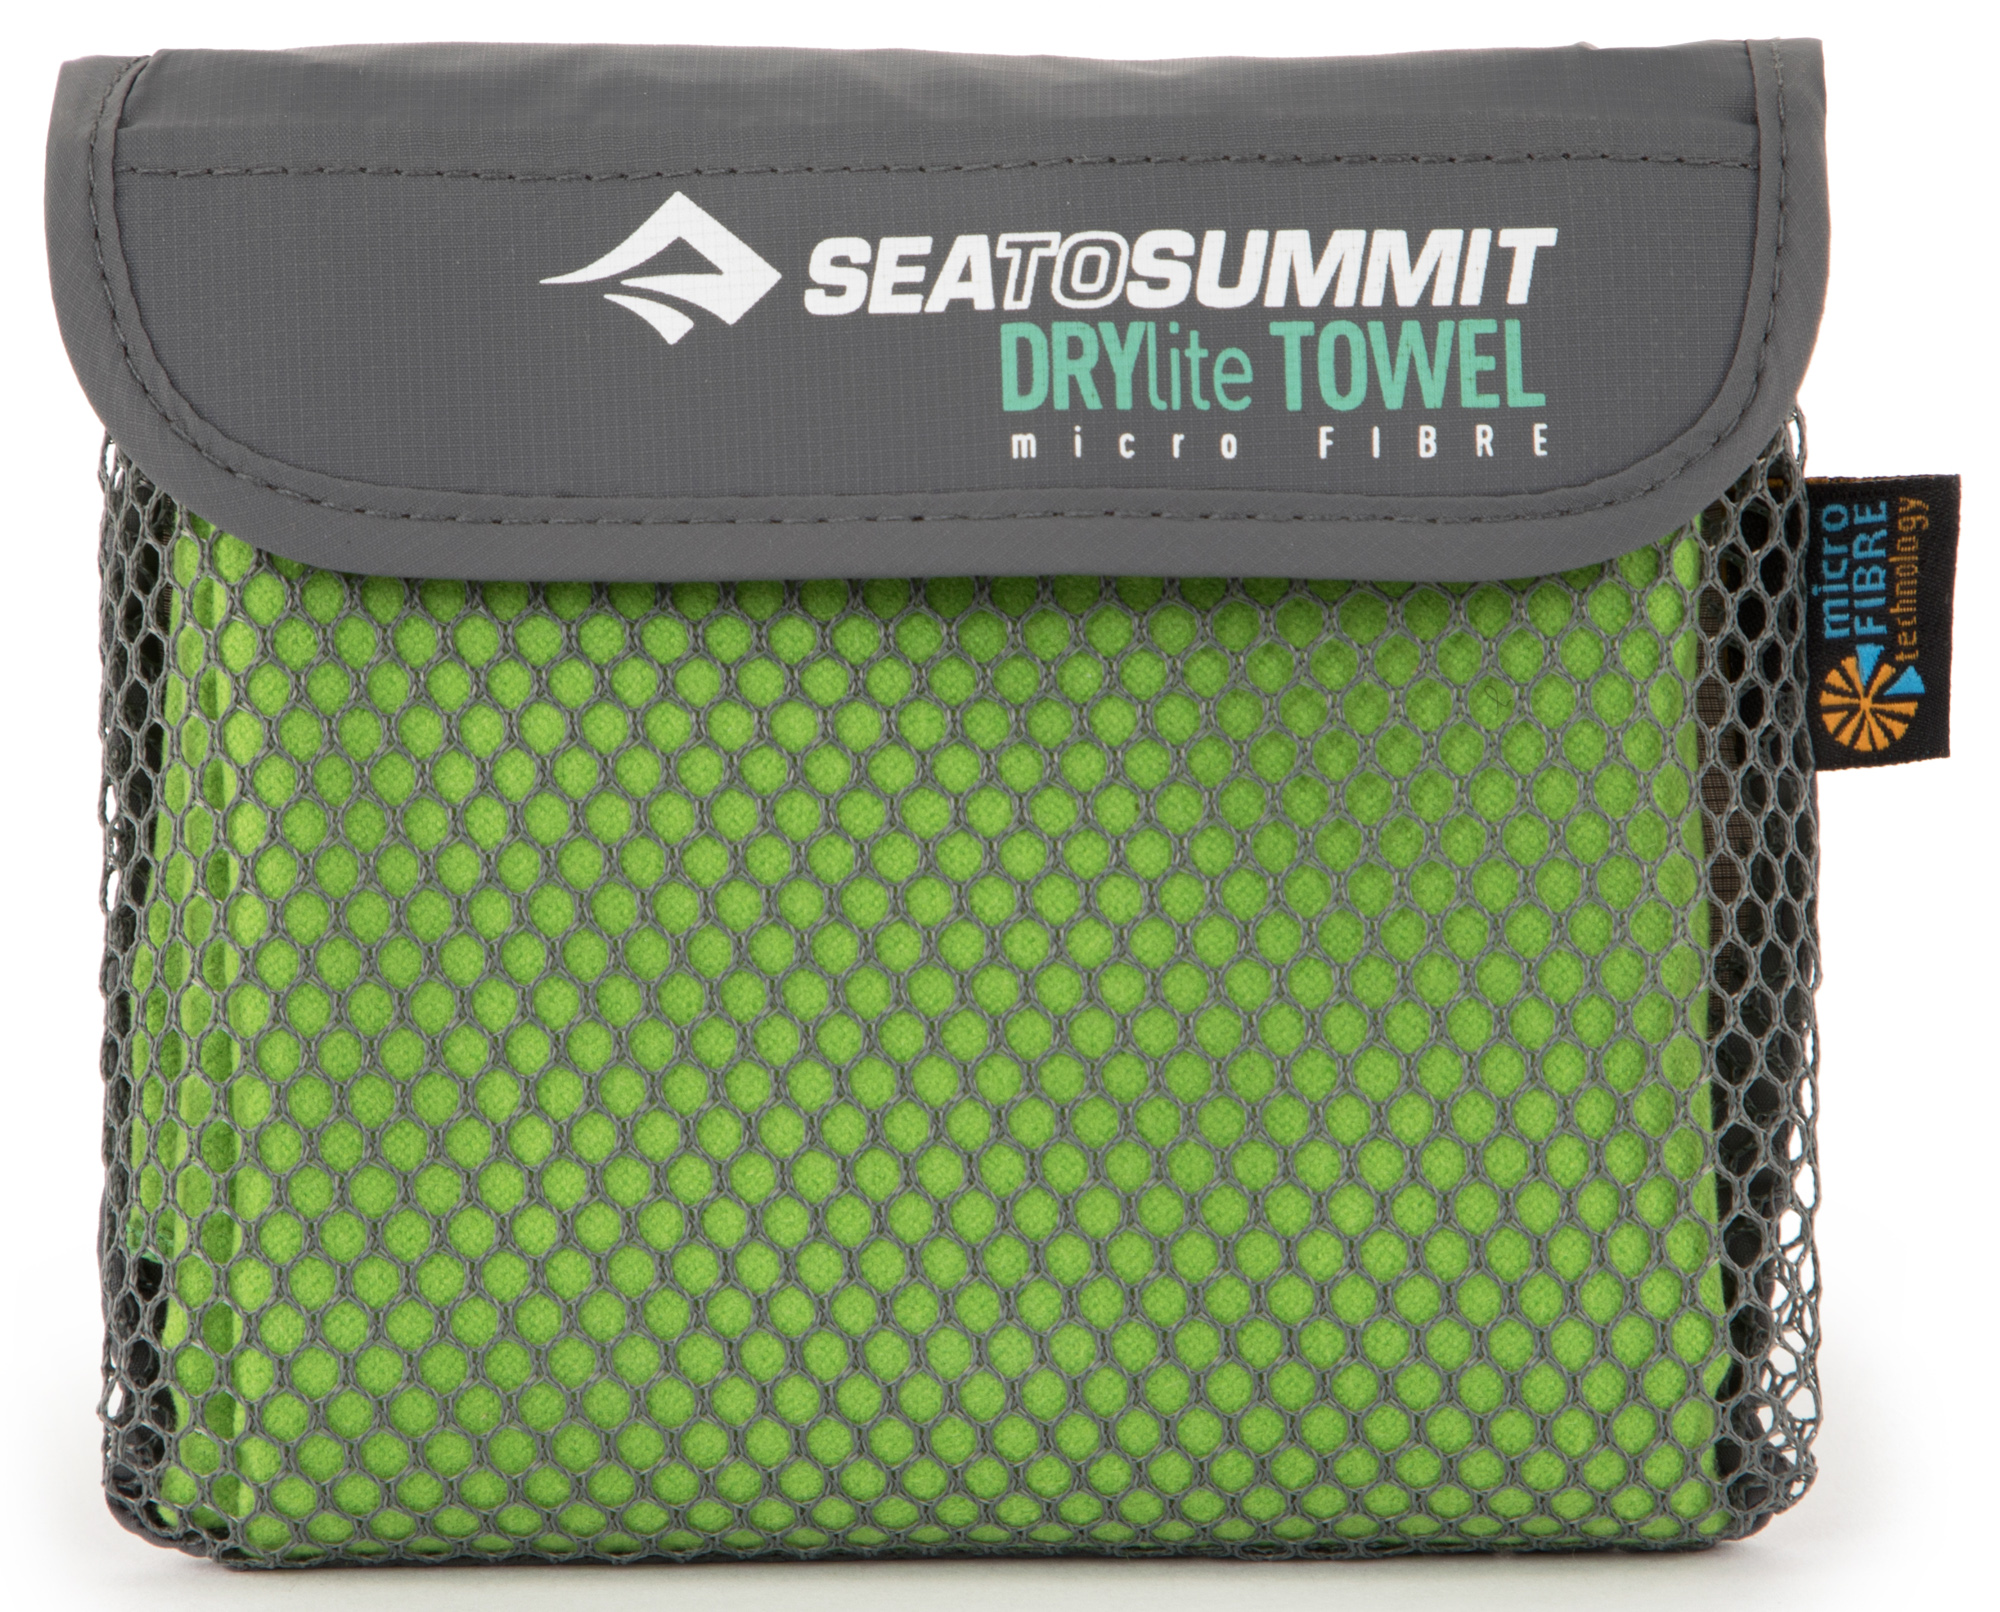 SEA TO SUMMIT Полотенце SEA TO SUMMIT DryLite 40 х 80 см комплектующие для спортивных сумок sea to summit 56928afrb25spp 2015 afrb25srpp